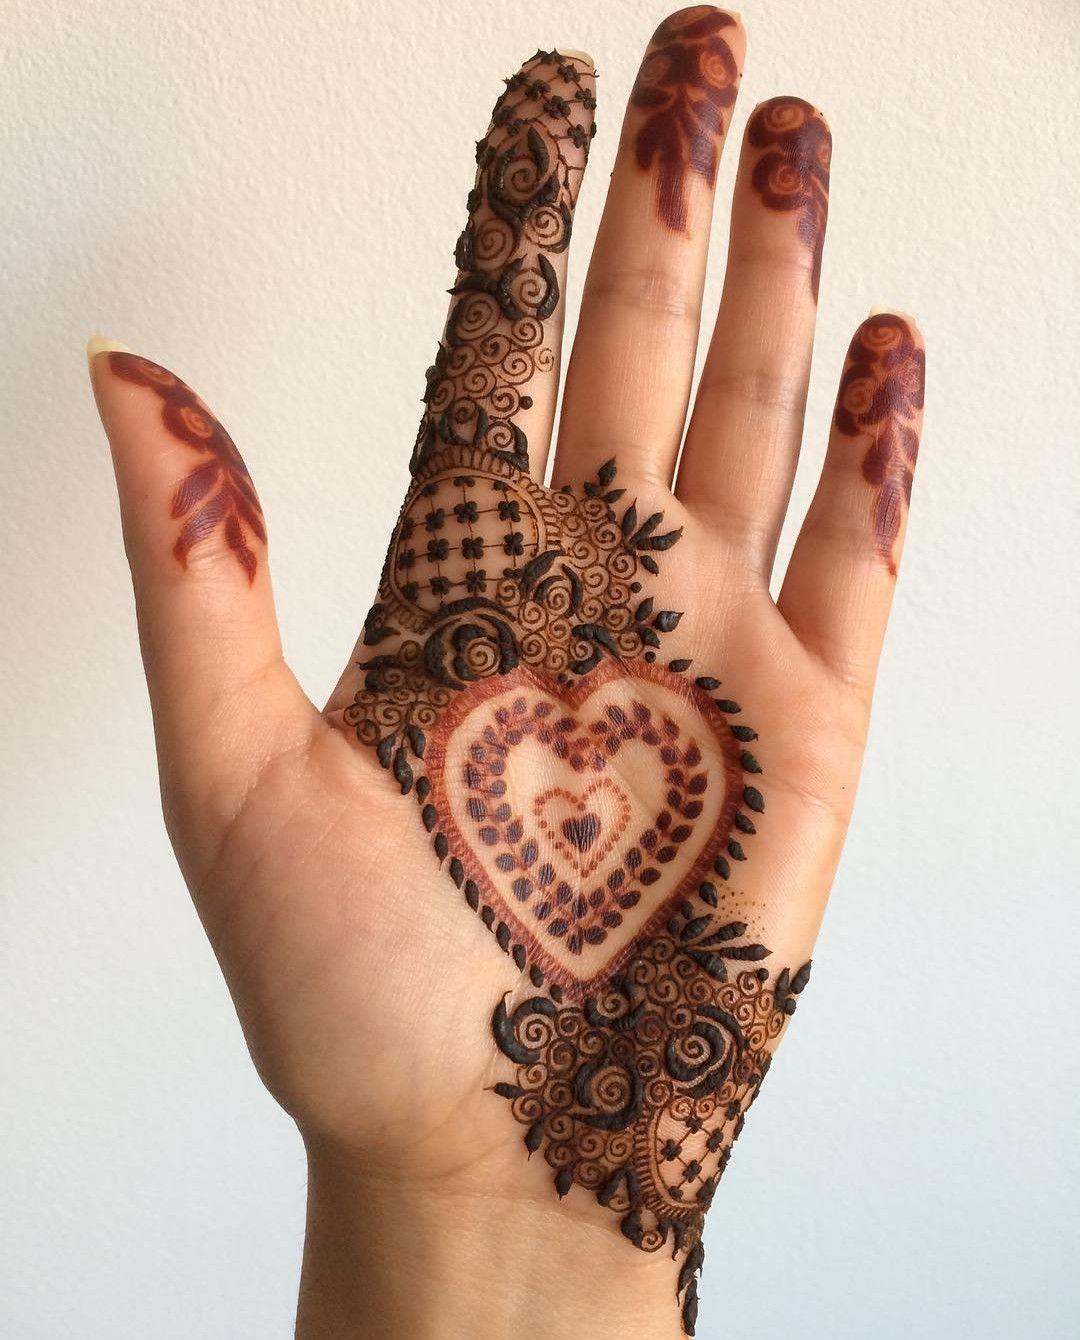 Mehndi art tattoo henna mehendi decor simple also pin by golden zucchini on design pinterest rh